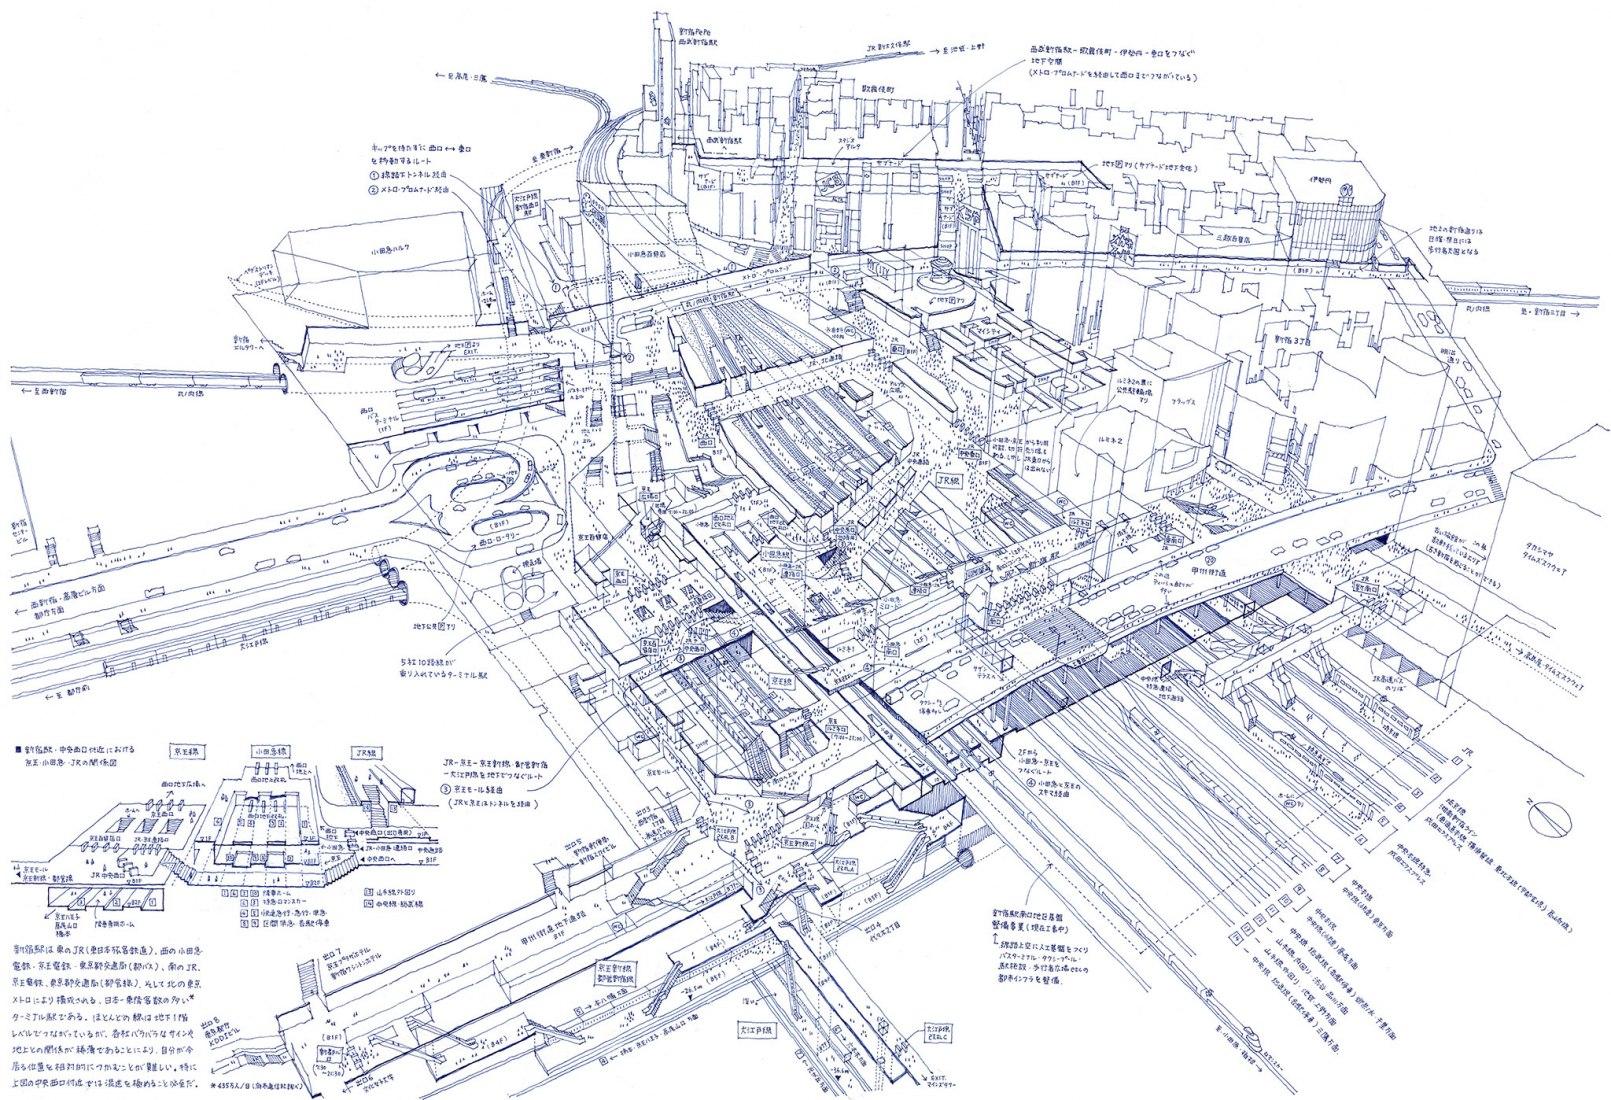 Tomoyuki Tanaka, Dismantling of Shinjuku Station, 2005. Courtesy of Japan Society.